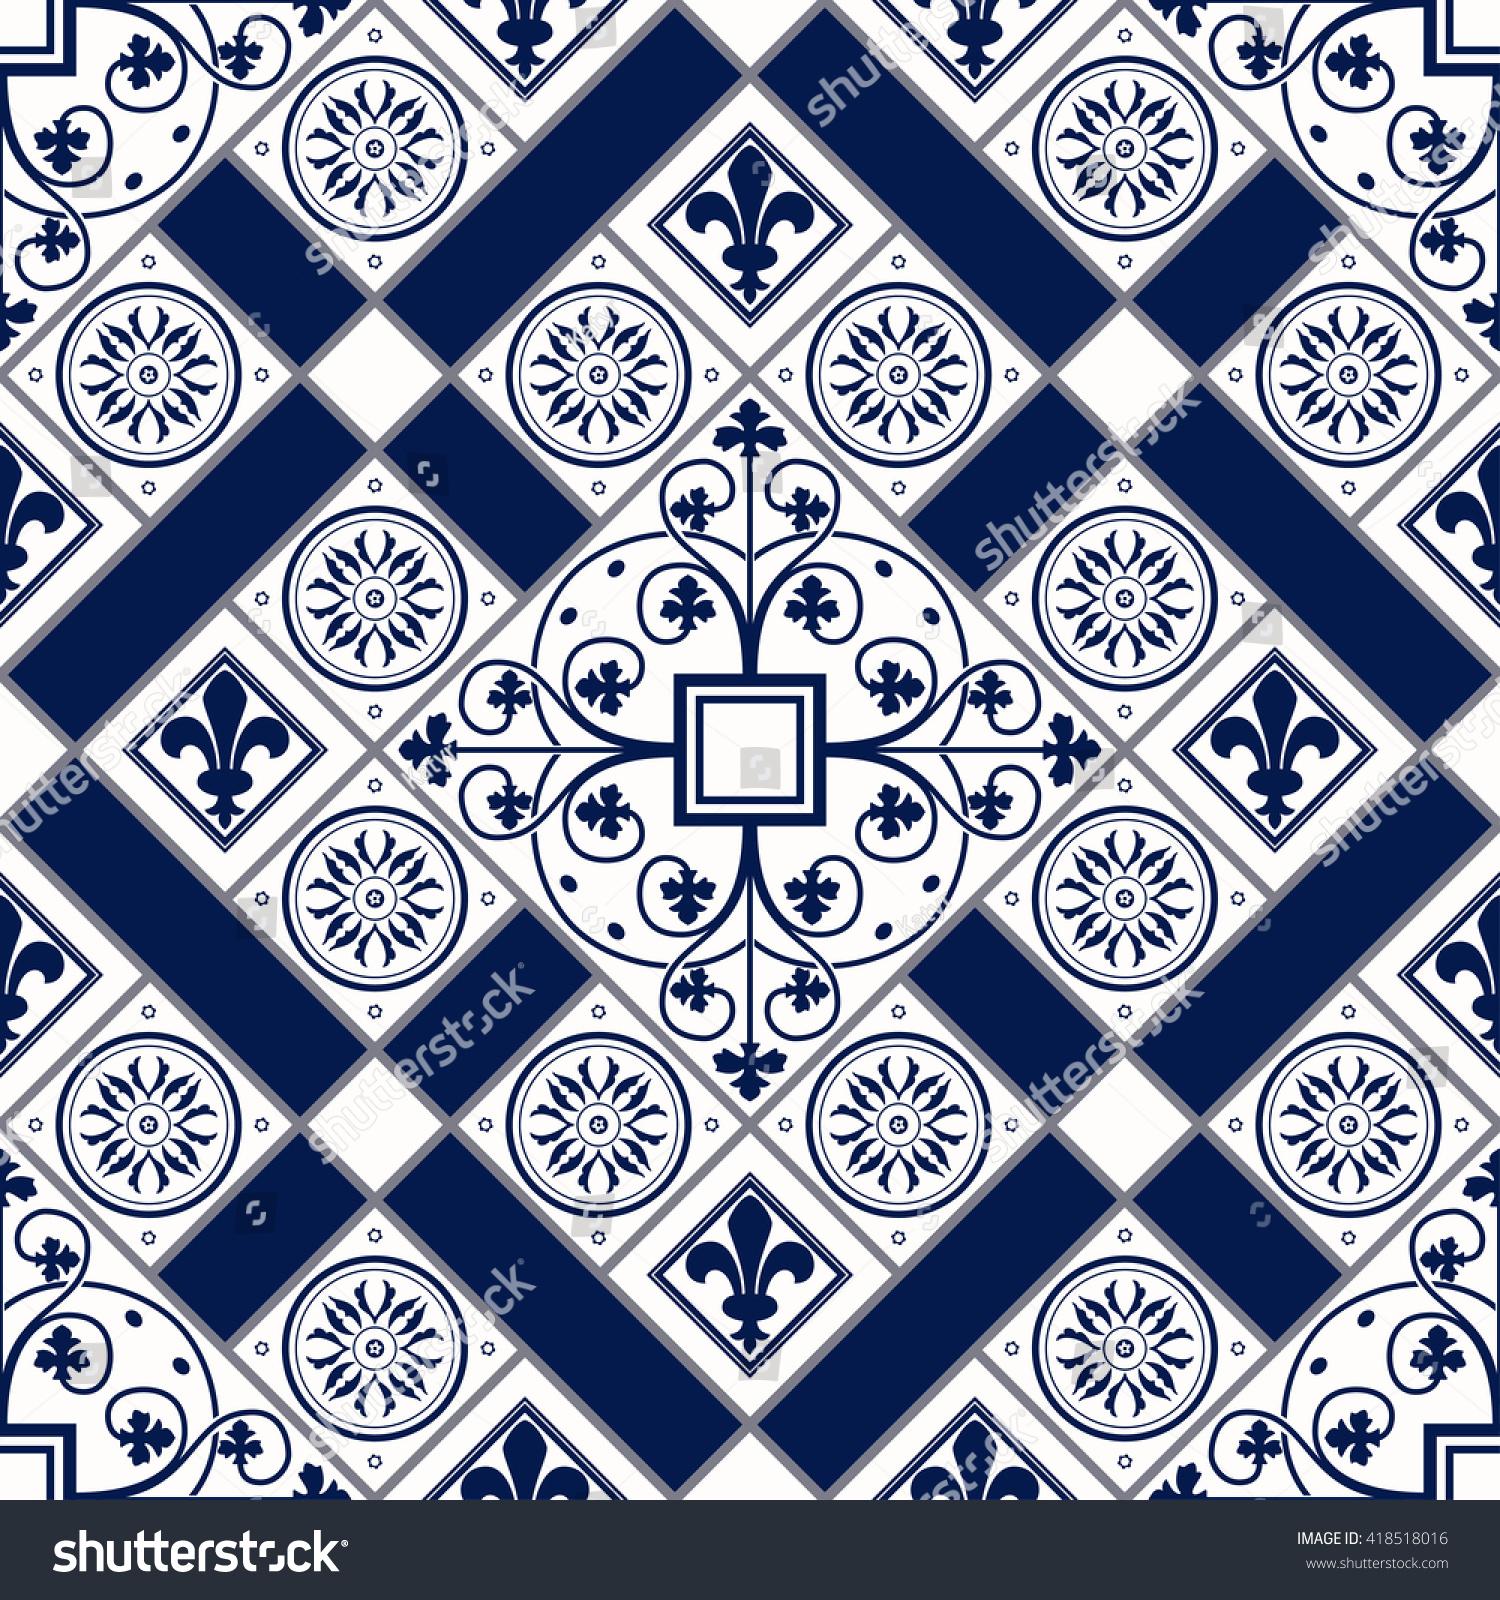 Vector of moroccan tile seamless pattern tile for design tile - Vector Of Moroccan Tile Seamless Pattern For Design Background Banner Spanish Element For